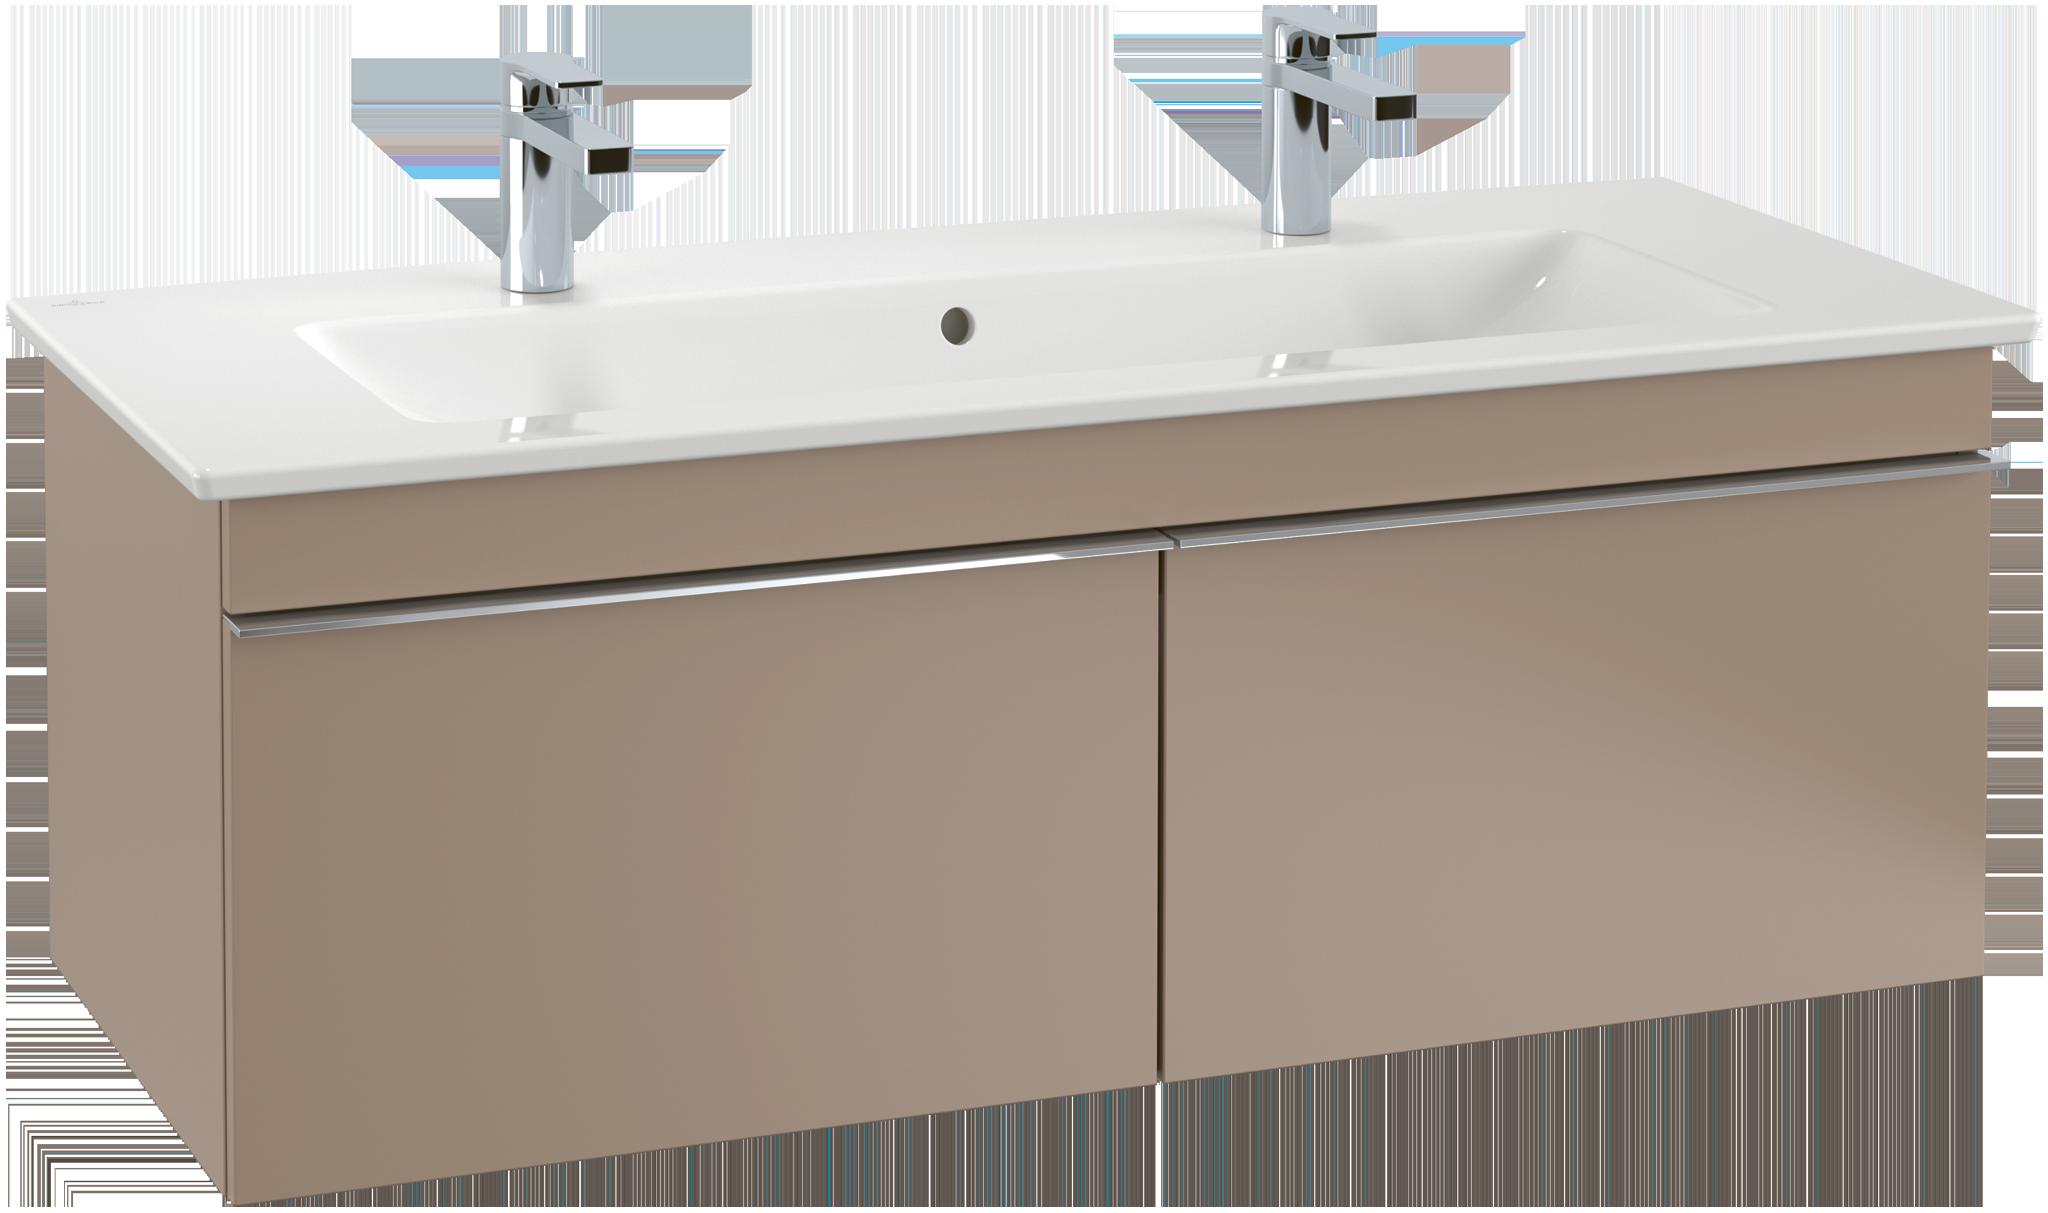 Venticello meuble sous lavabo a93801 villeroy boch for Meuble villeroy et boch